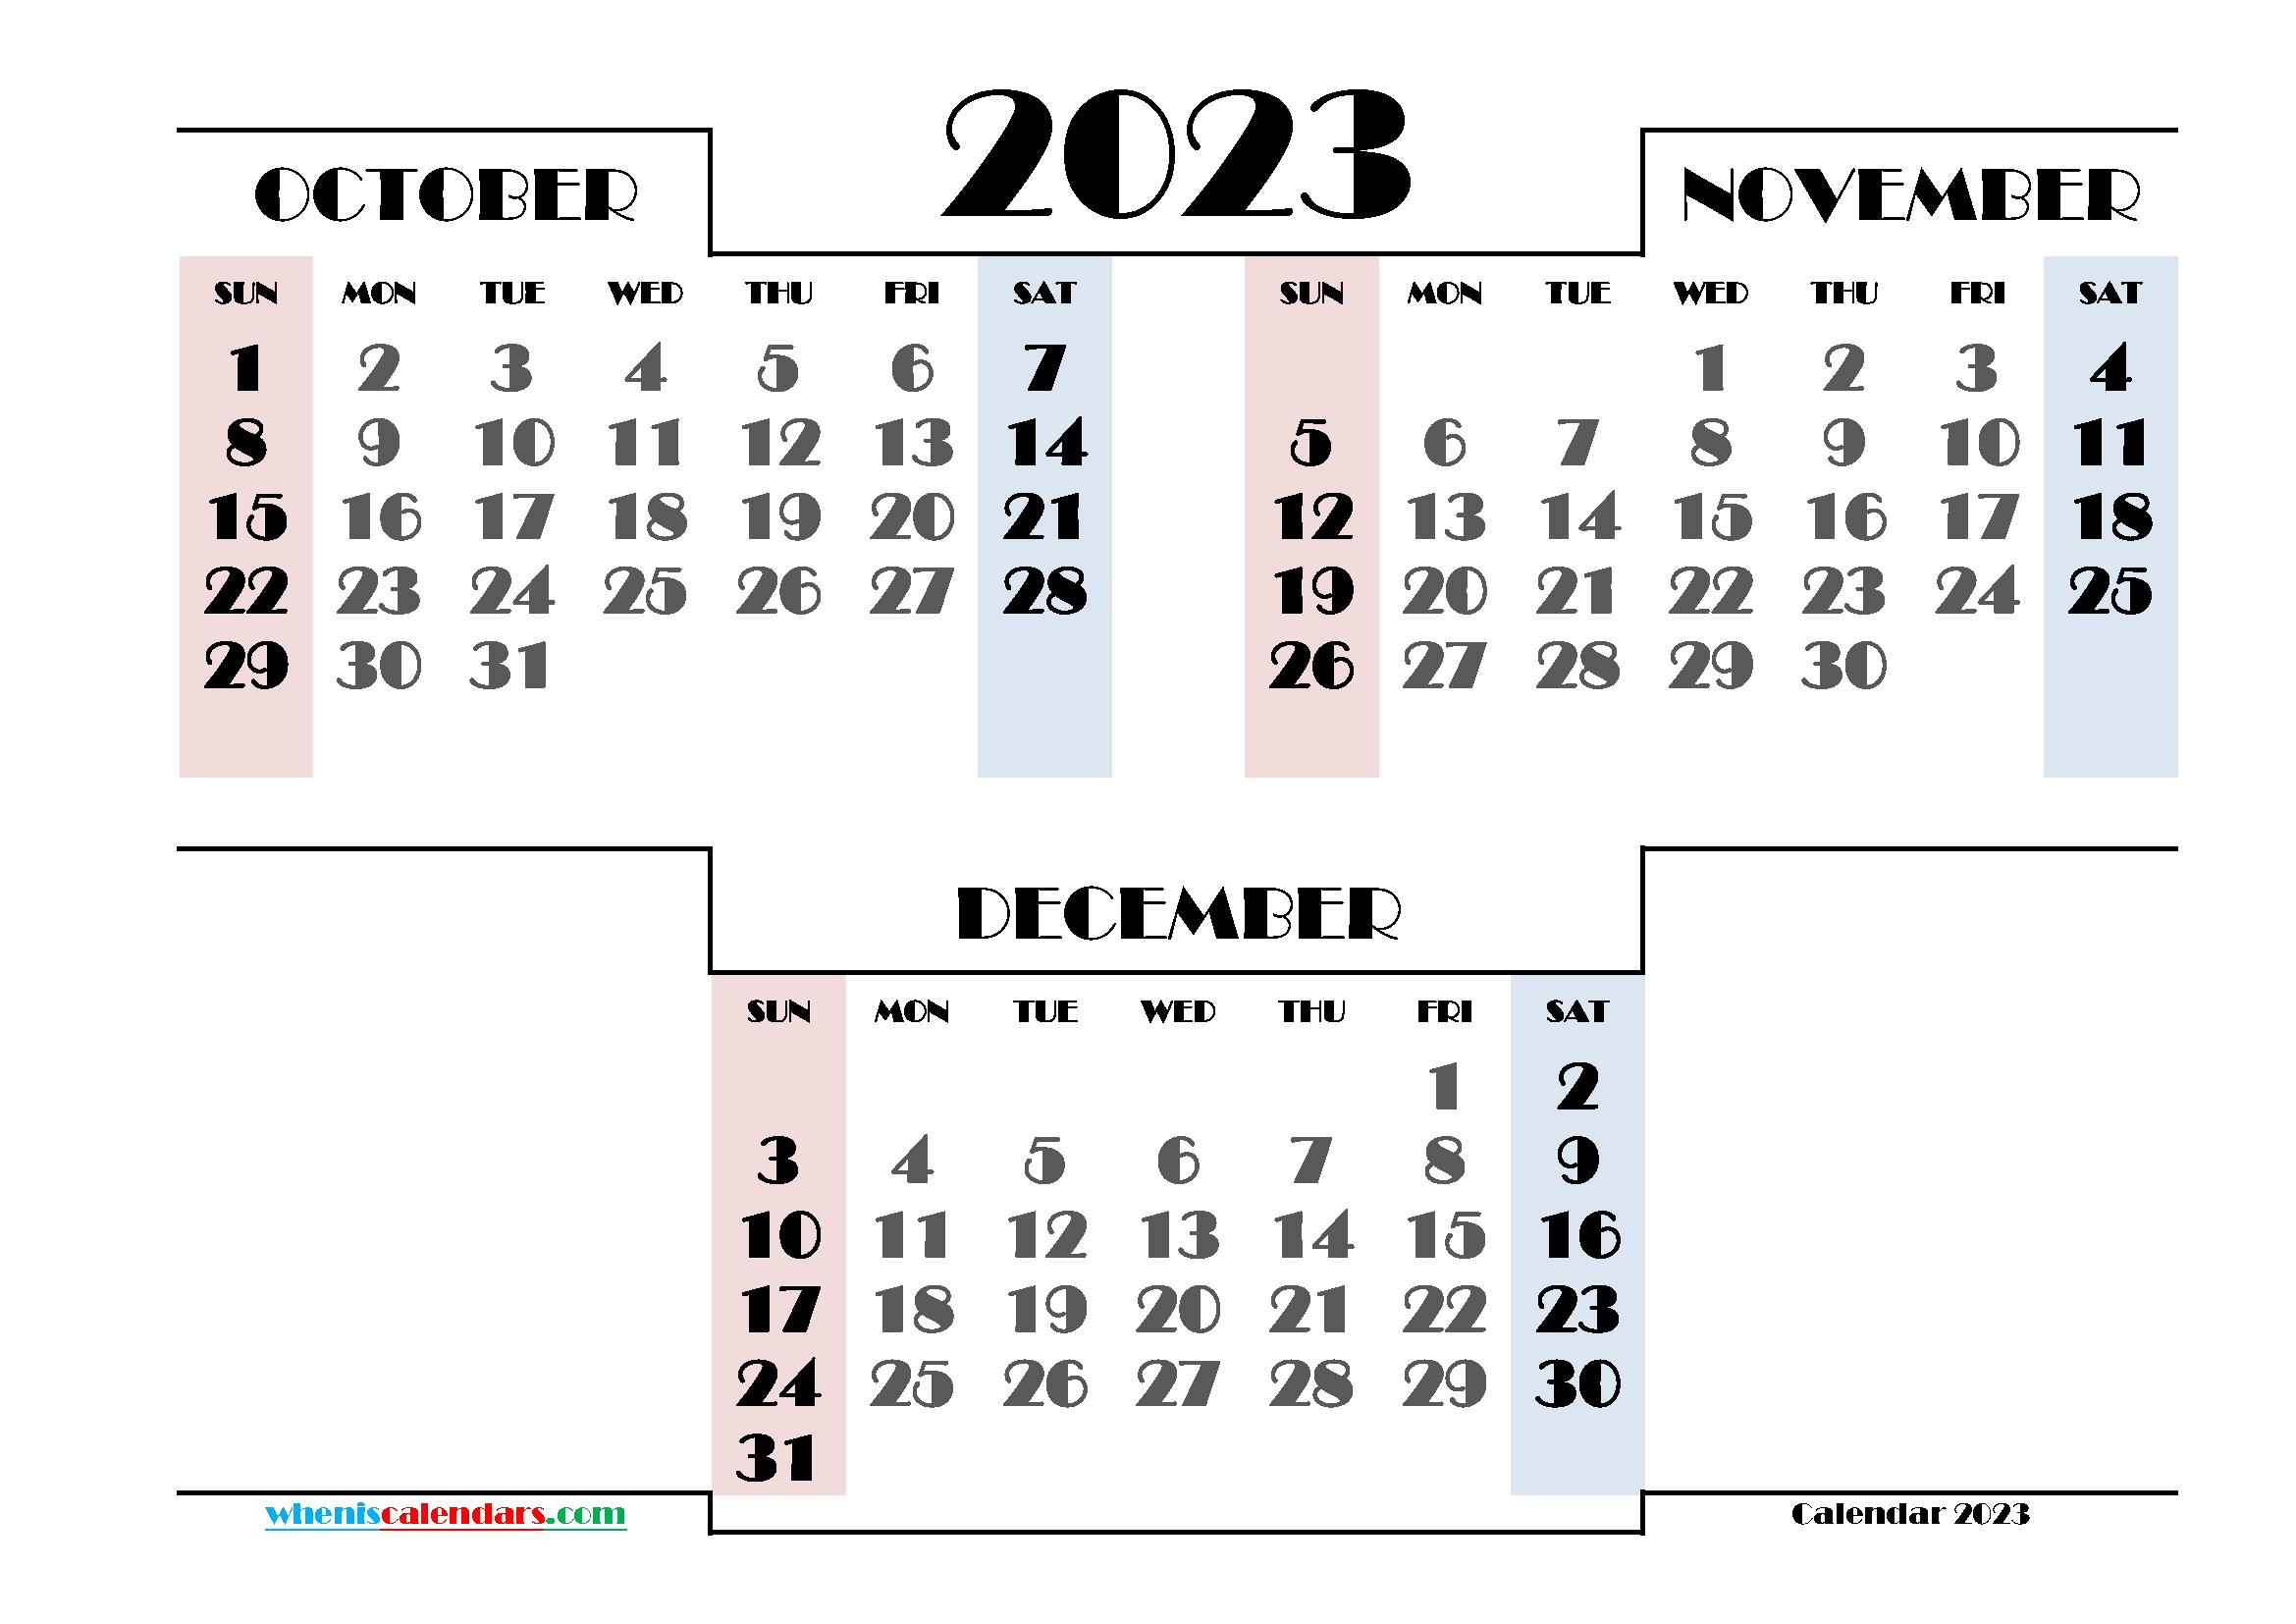 October November December 2023 Printable Calendar Free